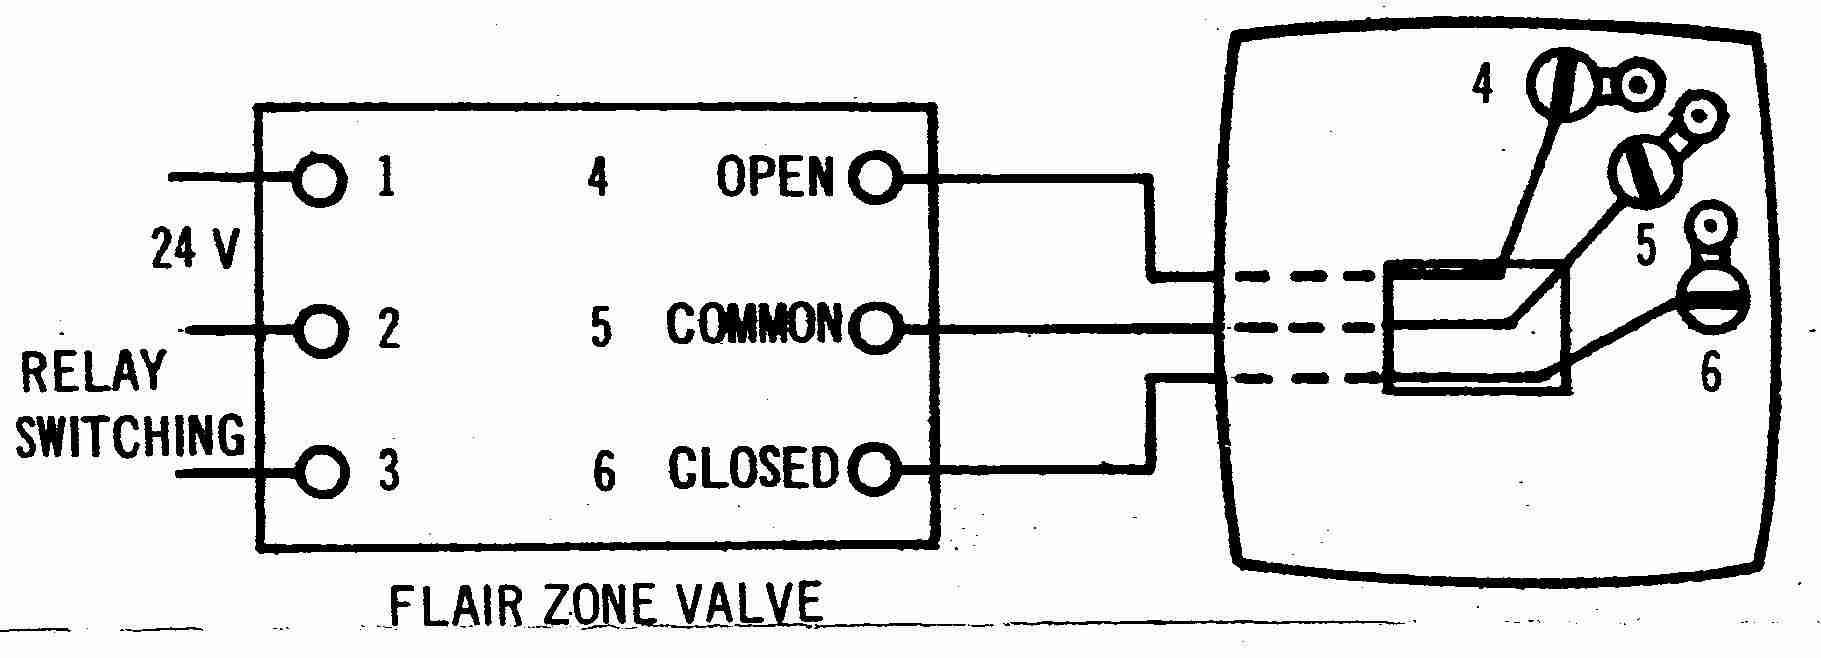 White Rodgers Aquastat Wiring Diagram | Manual E-Books - White Rodgers Gas Valve Wiring Diagram